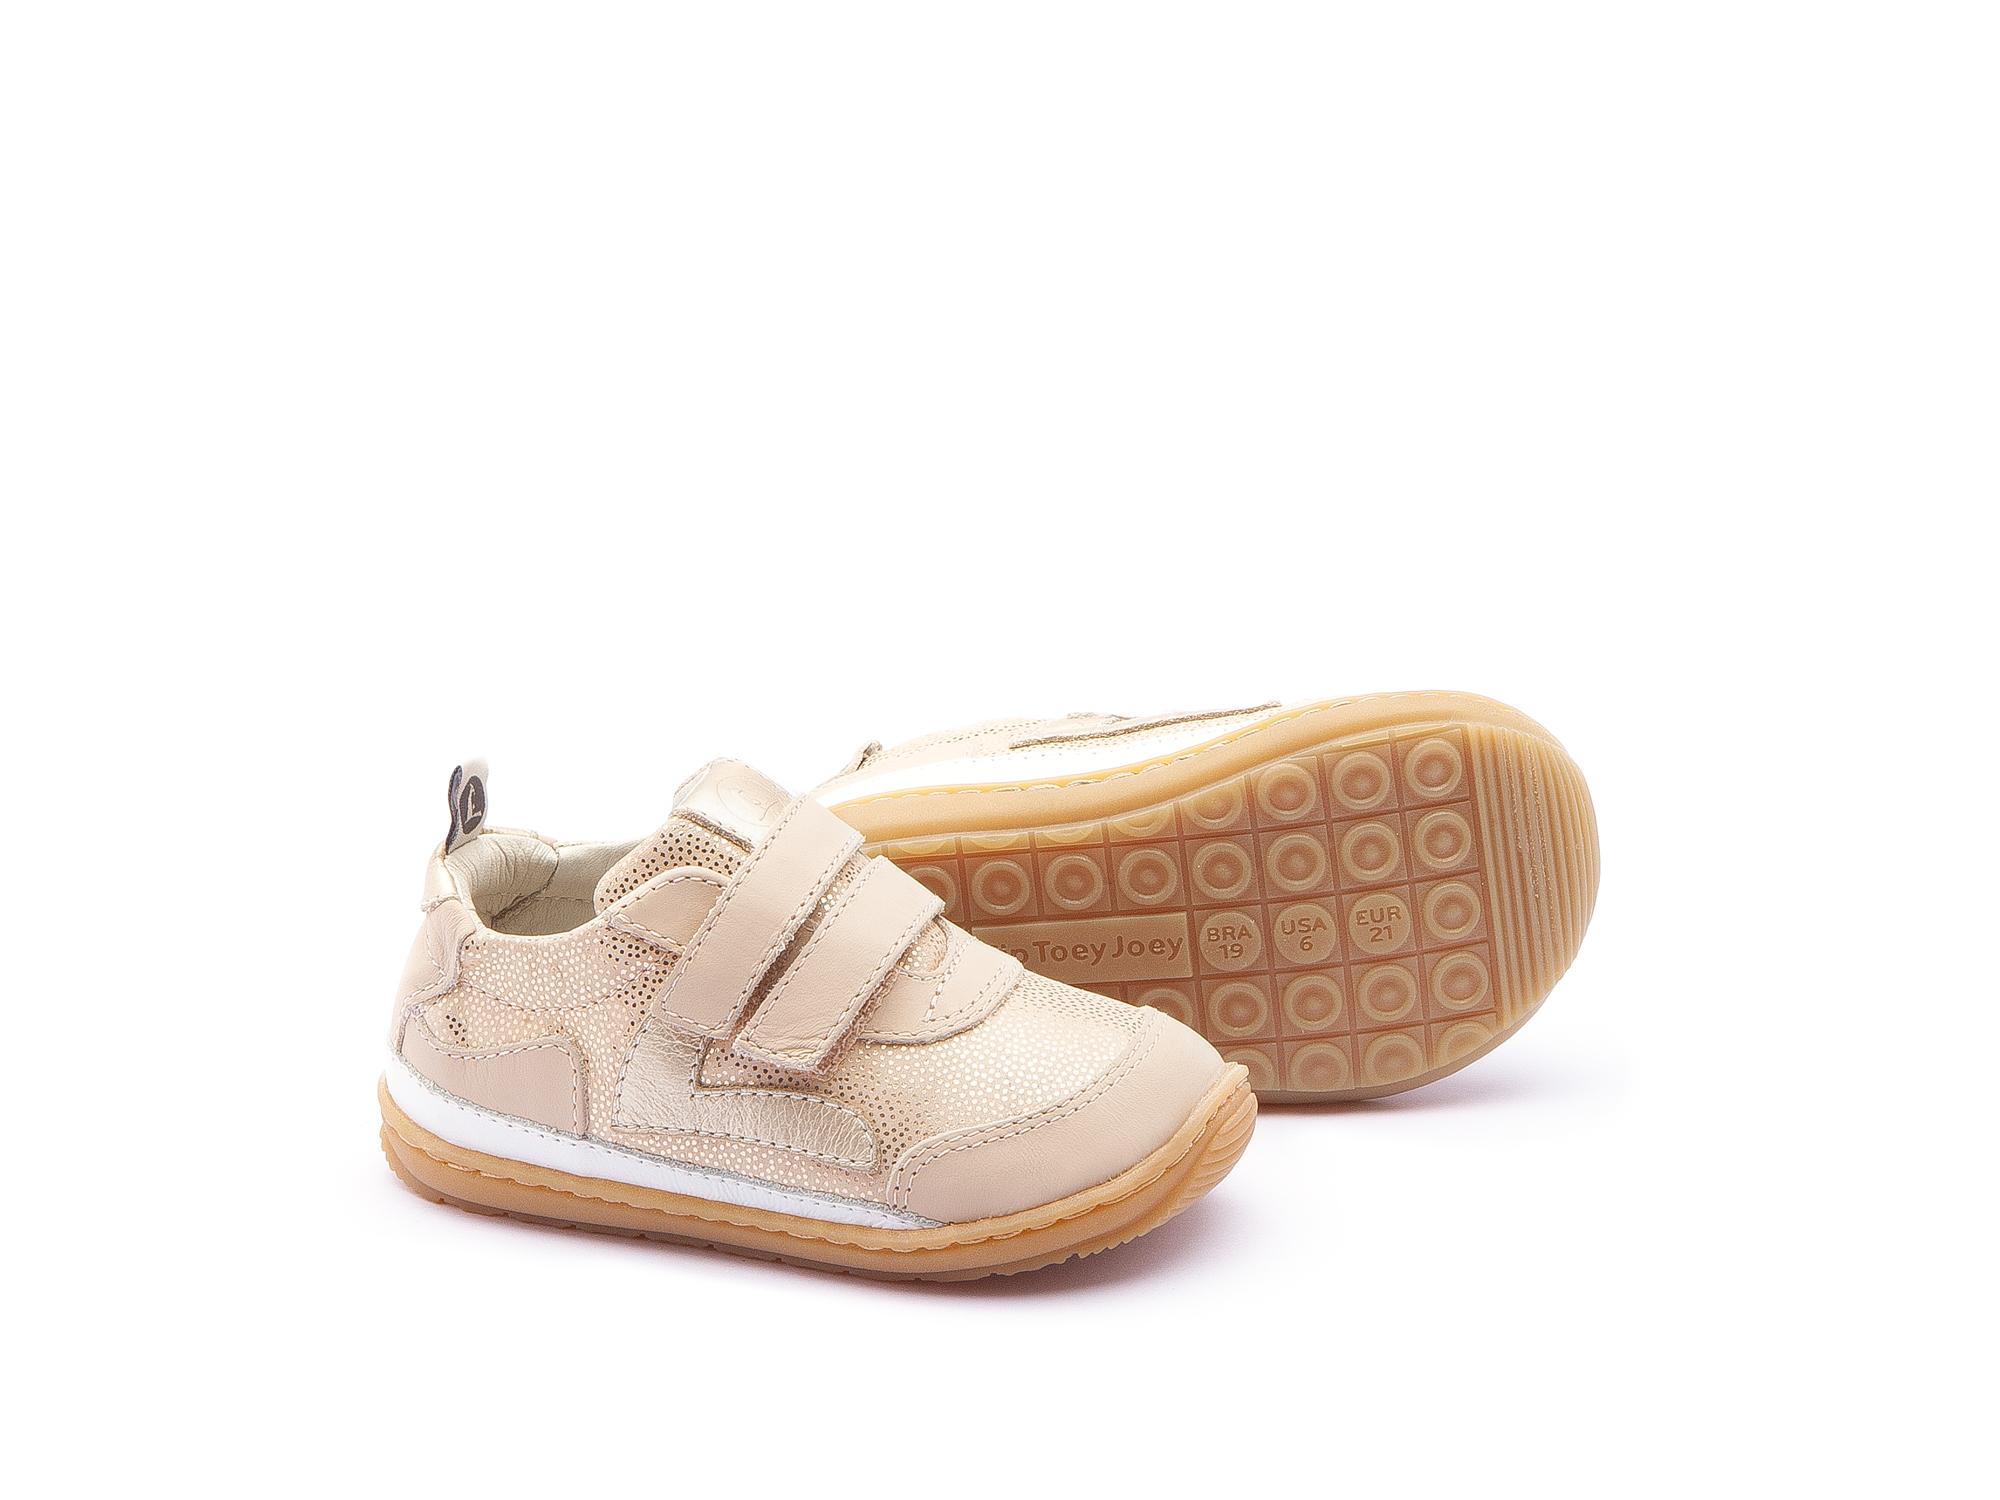 Sneaker Casual Jumpy Golden Sugar/ Yogurt Baby 0 à 2 anos - 2